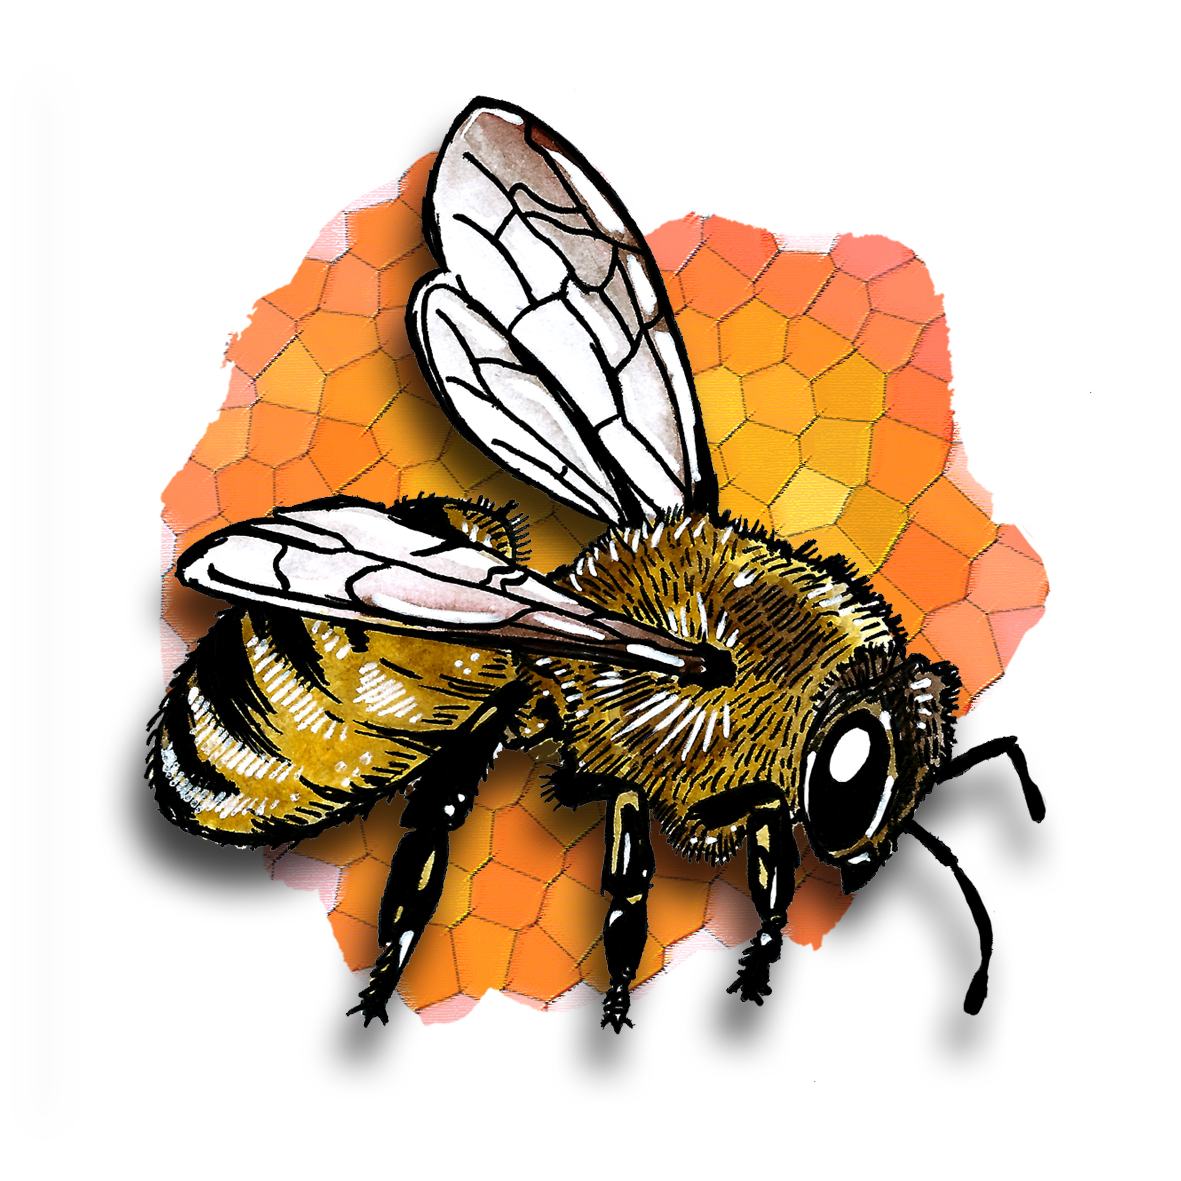 21. Bee